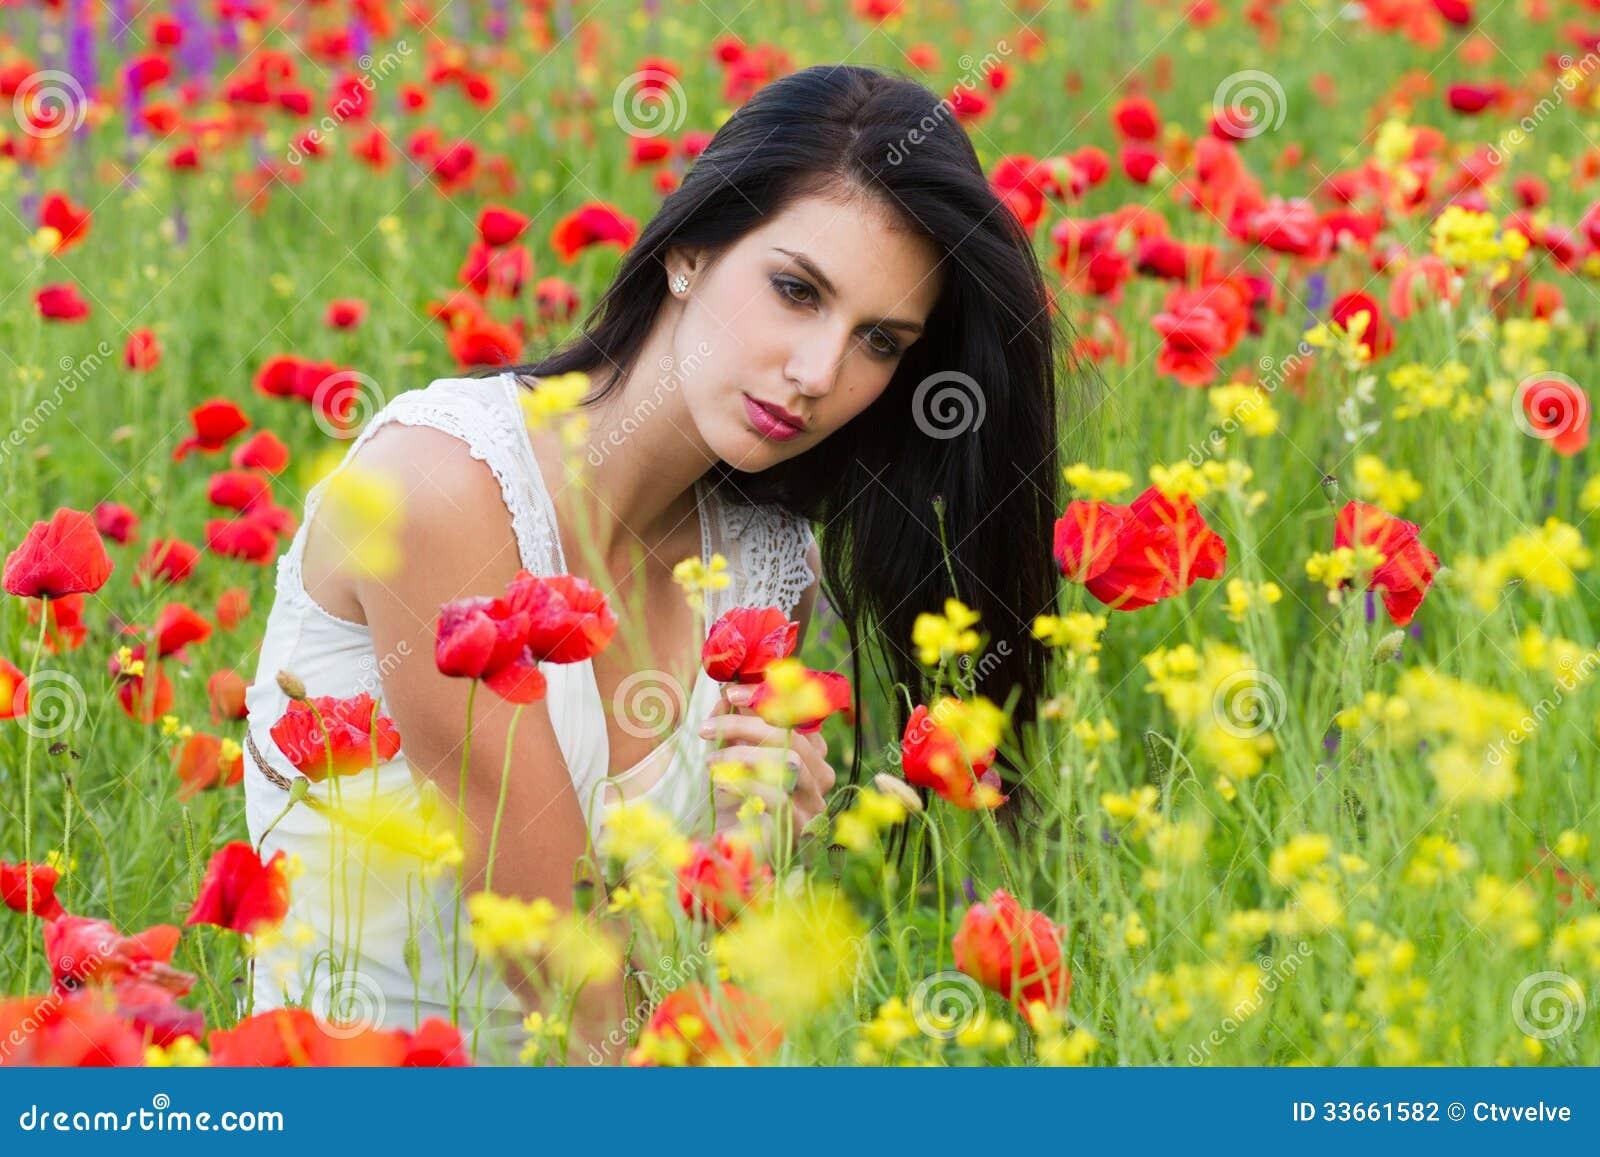 Beautiful girl sitting in the poppy flower field stock photo image beautiful girl sitting in the poppy flower field izmirmasajfo